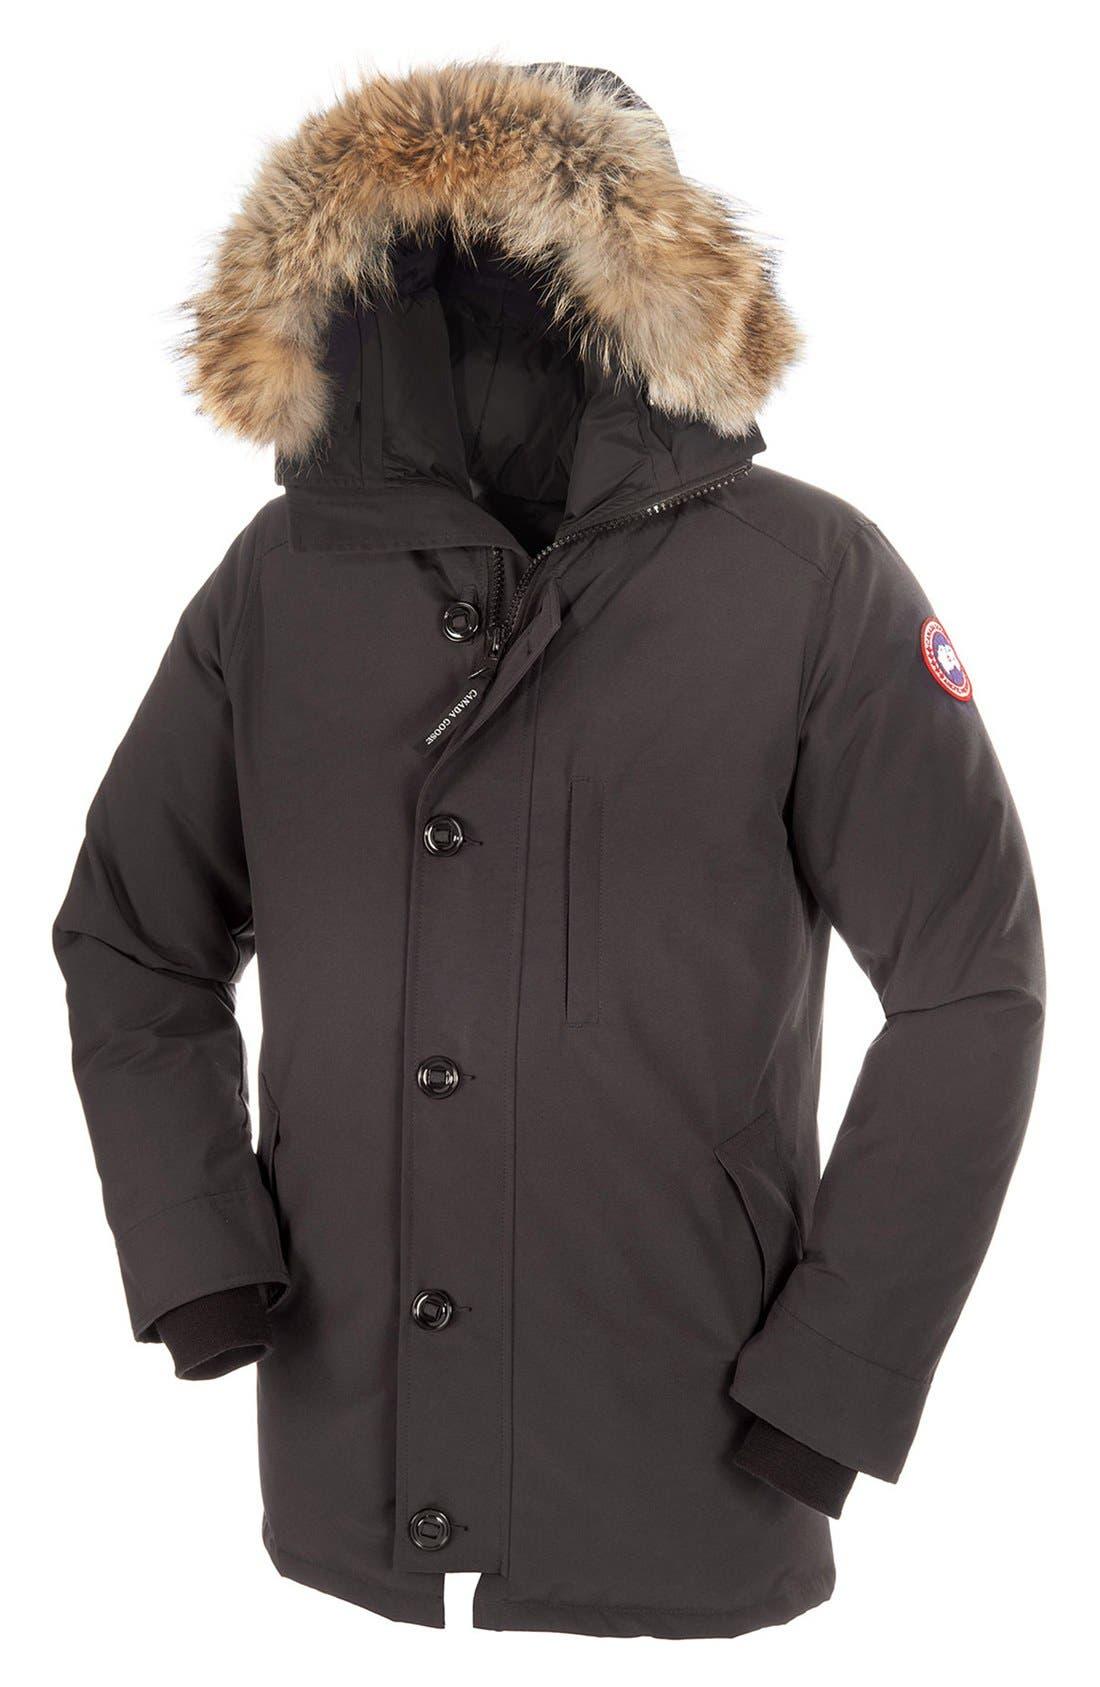 'Chateau' Slim Fit Genuine Coyote Fur Trim Jacket,                             Alternate thumbnail 5, color,                             021